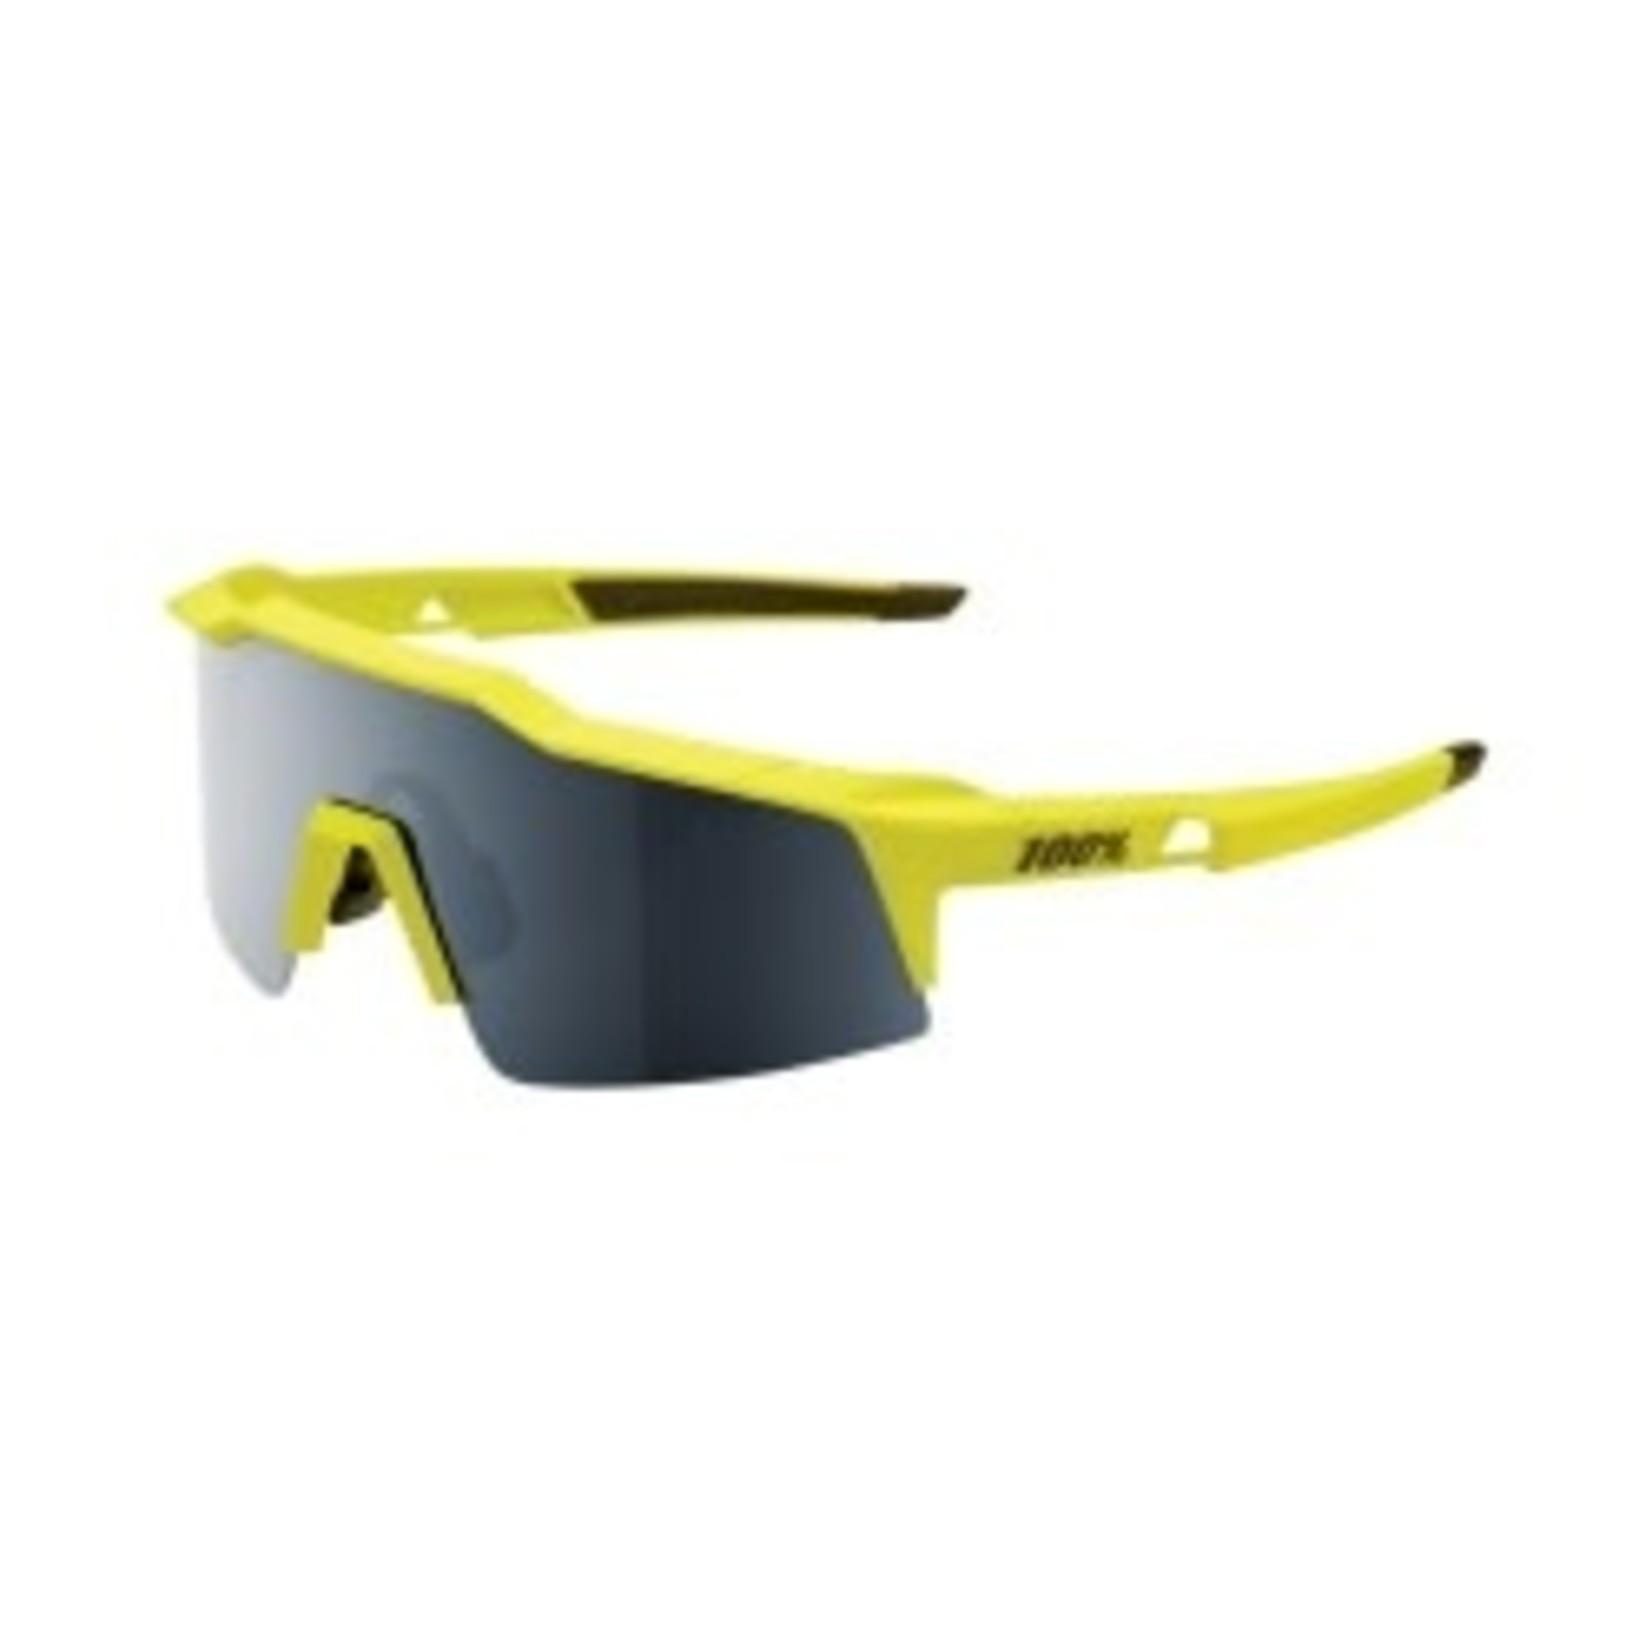 100% 100% - Occhiali Speedcraft SL